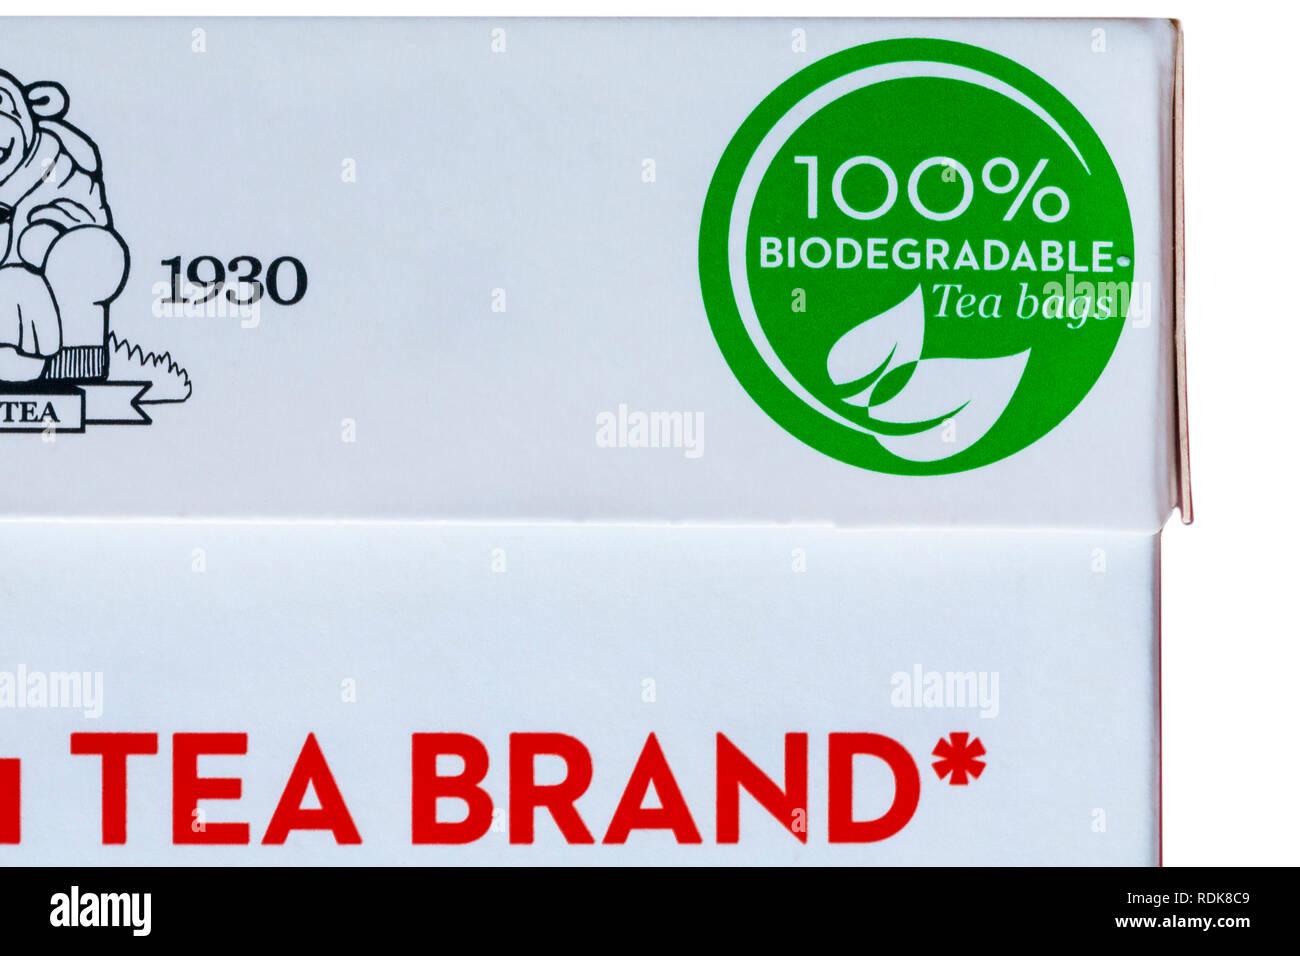 Biodegradable Logo Stock Photos & Biodegradable Logo Stock